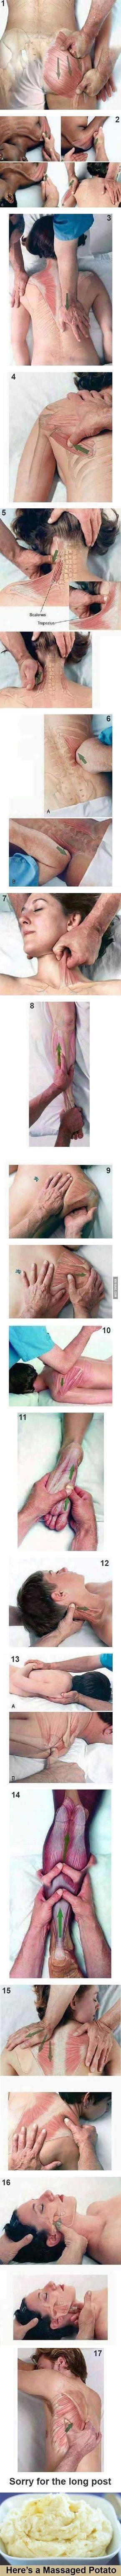 Massaggi muscolari